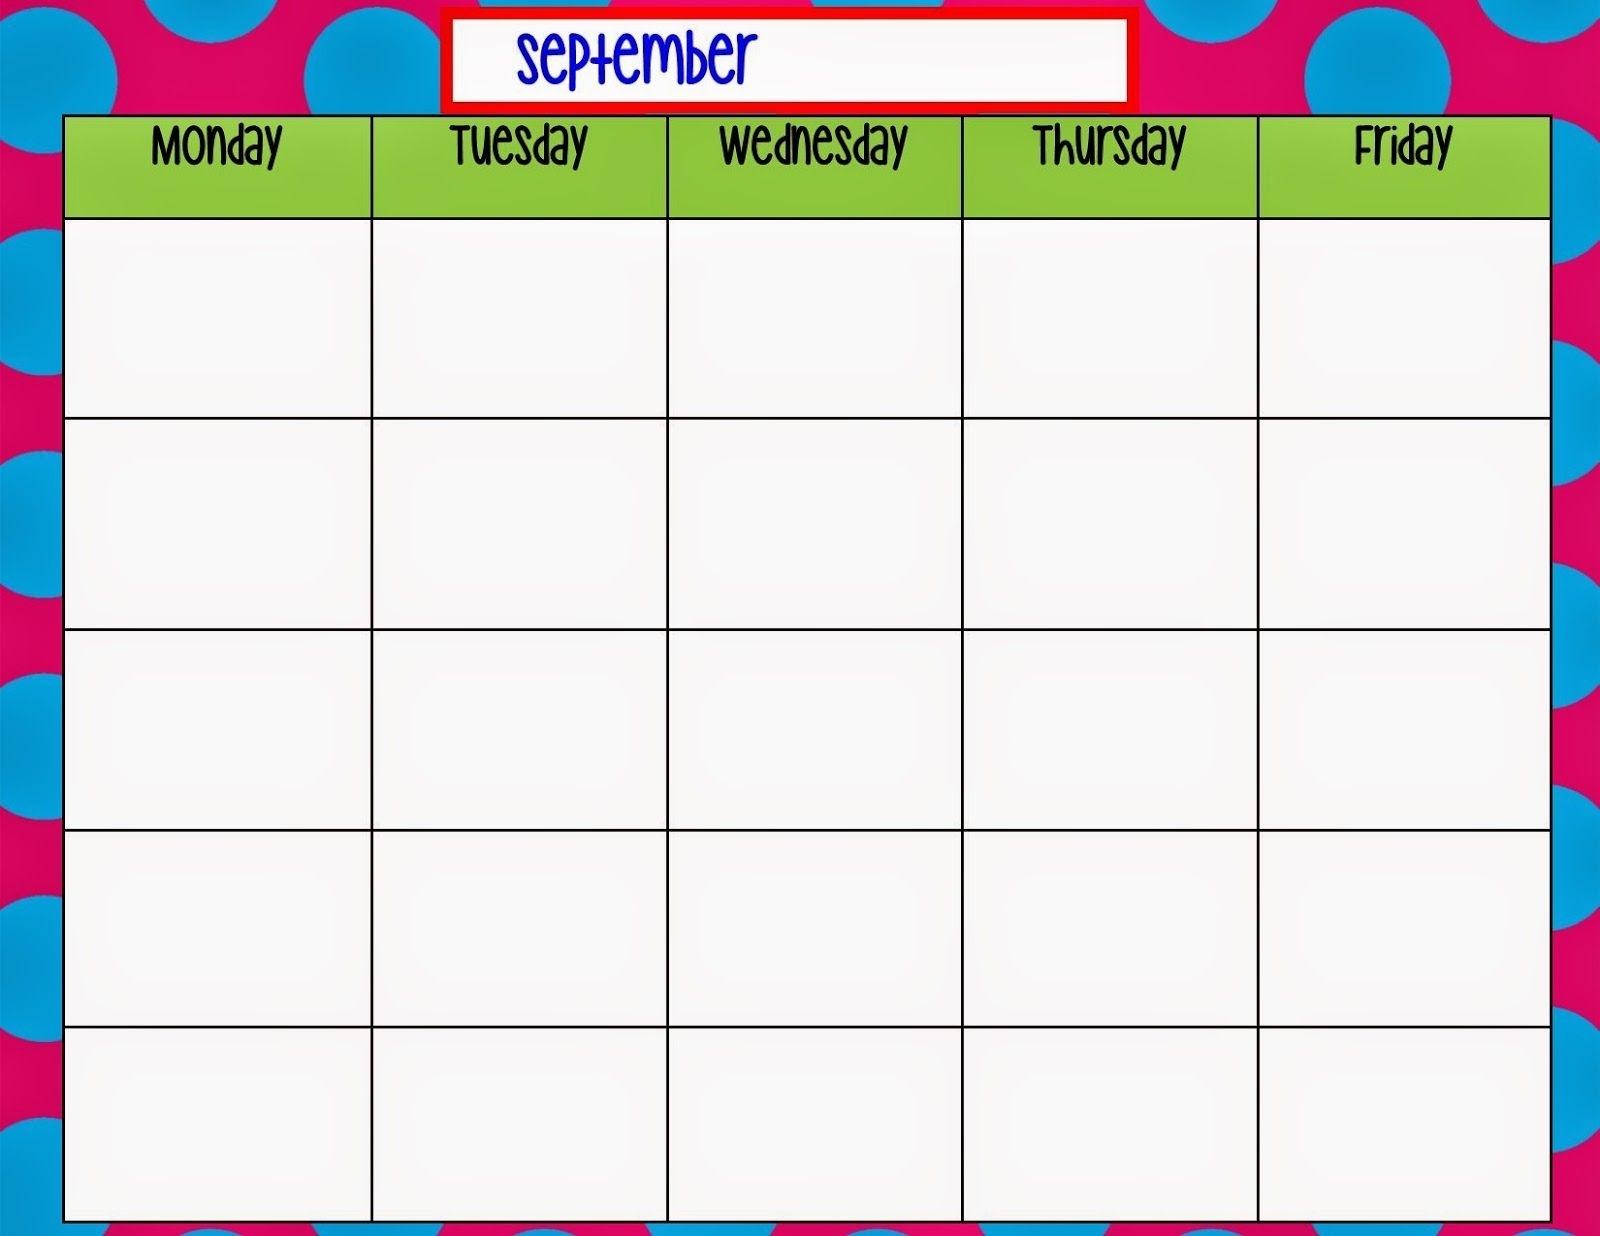 Monday Through Friday Calendar Template | Preschool | Printable with regard to Monday Through Friday Blank Schedule Print Out